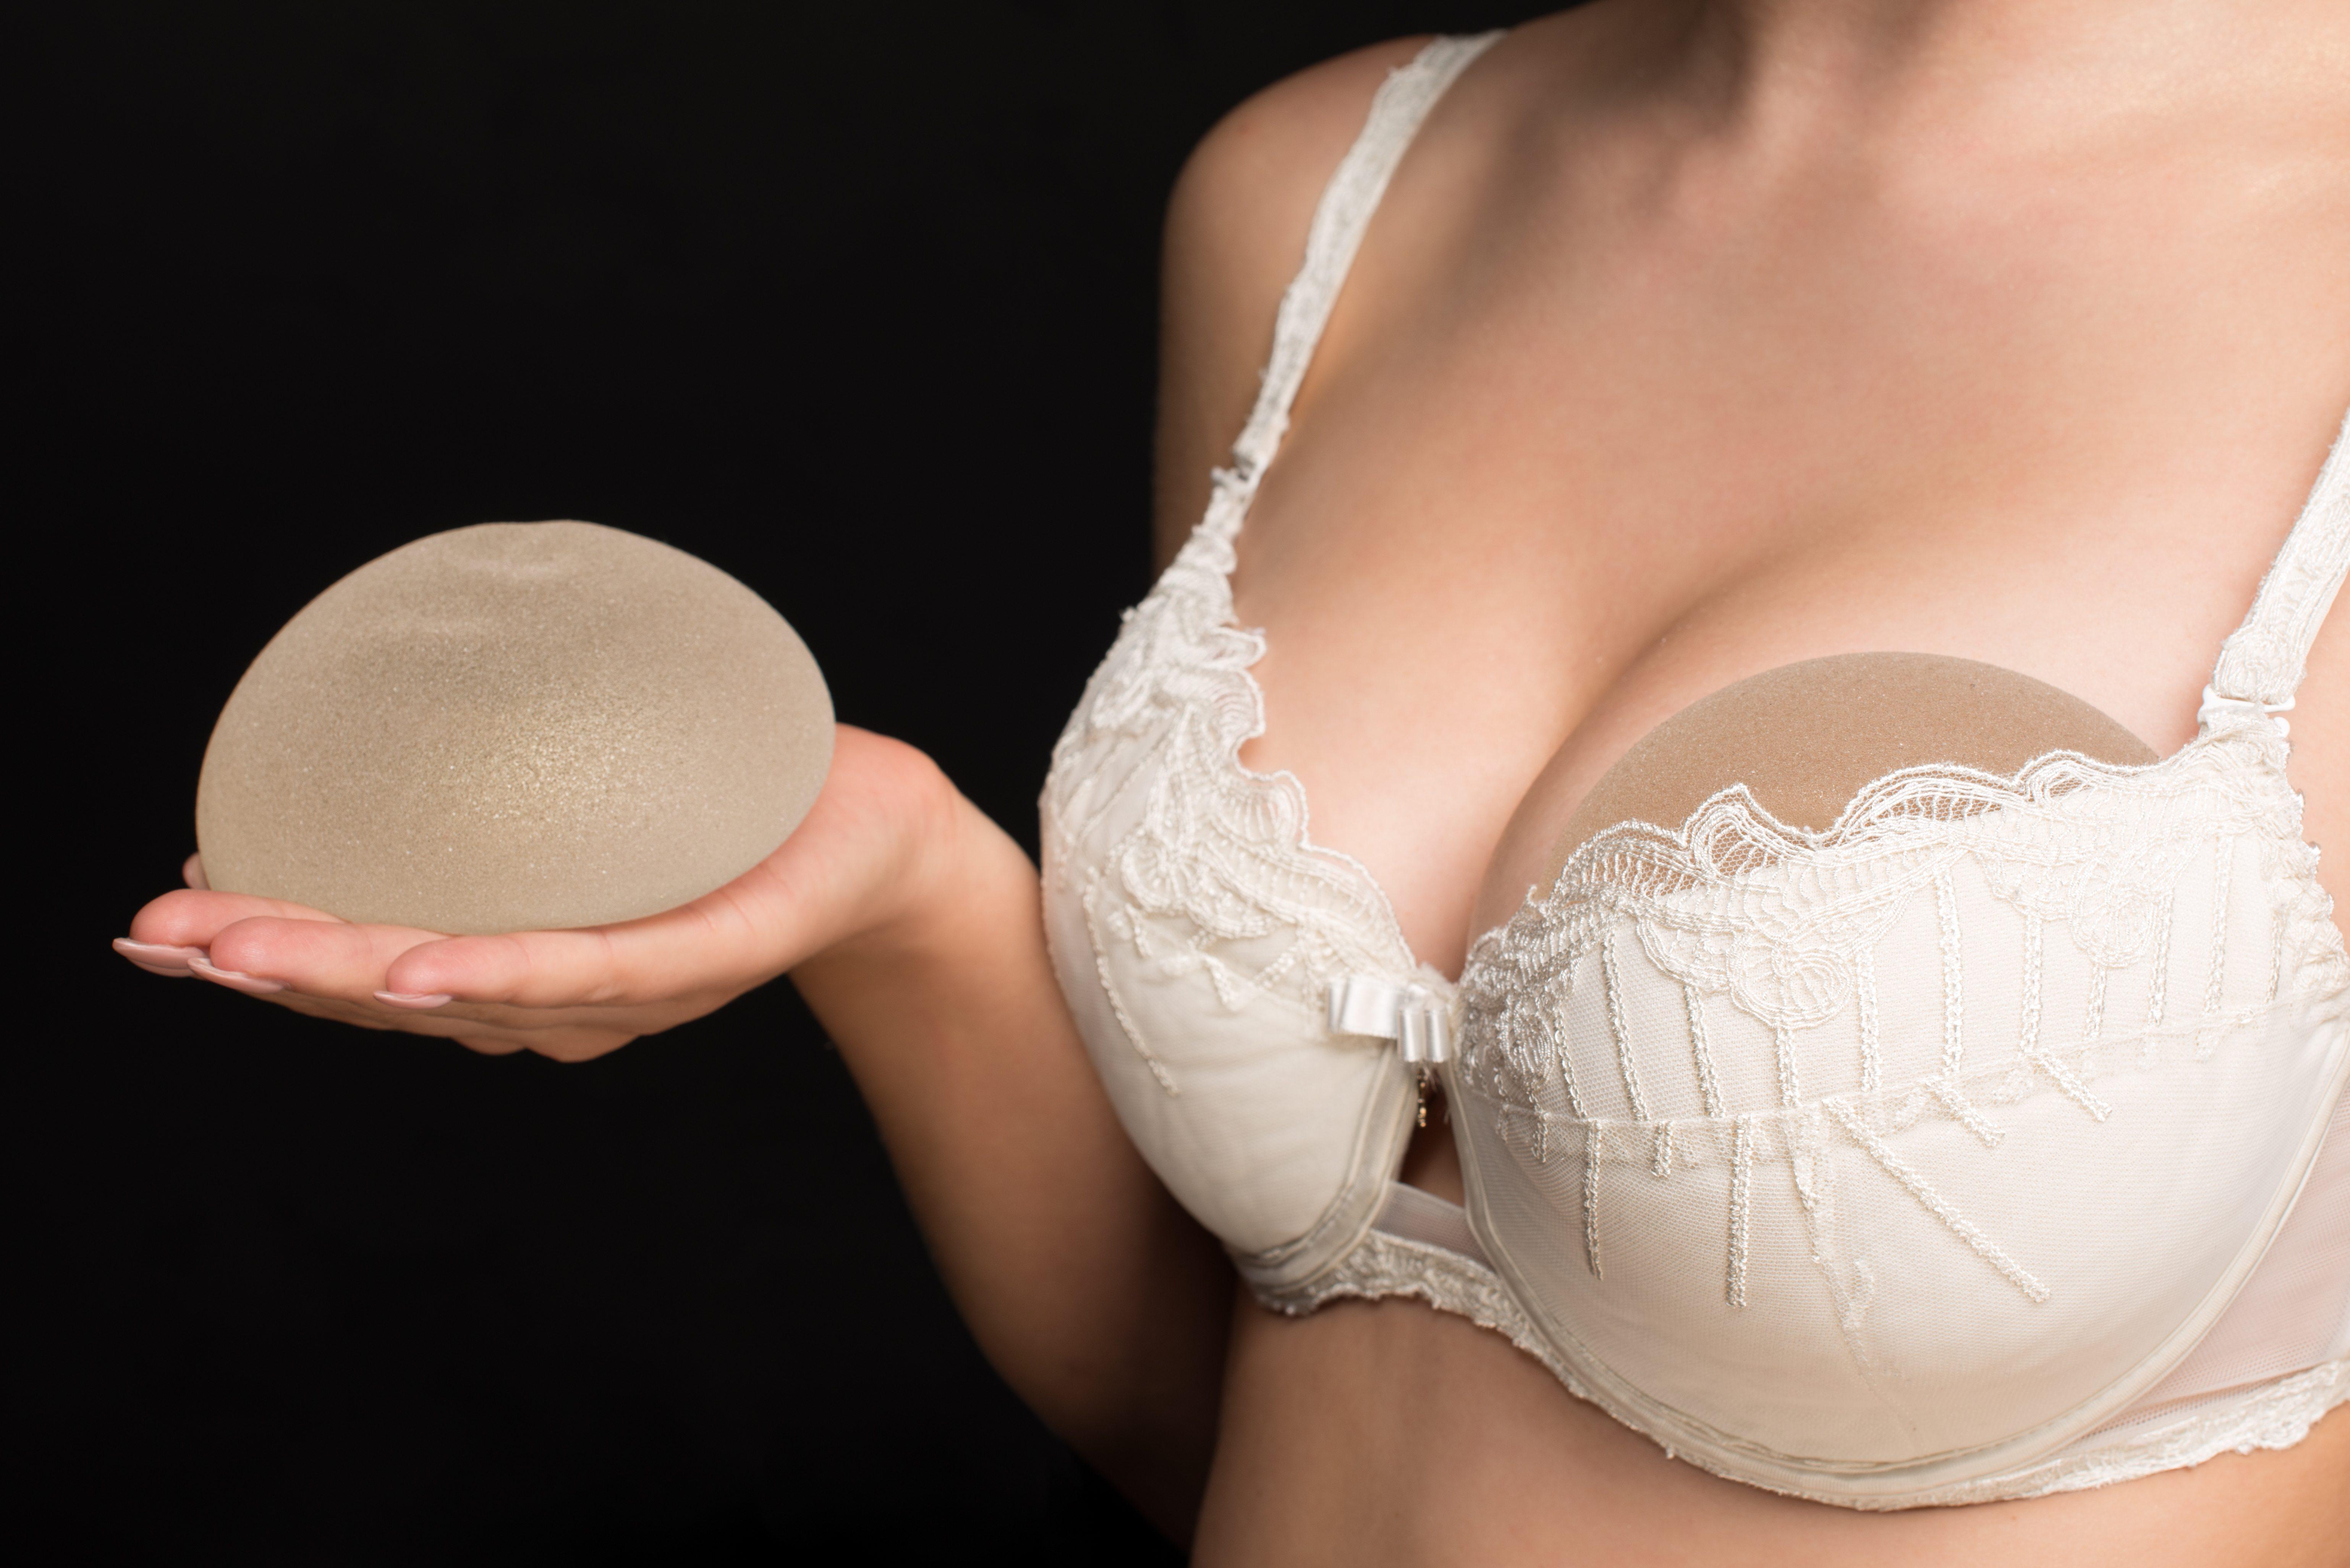 Sensitive breast